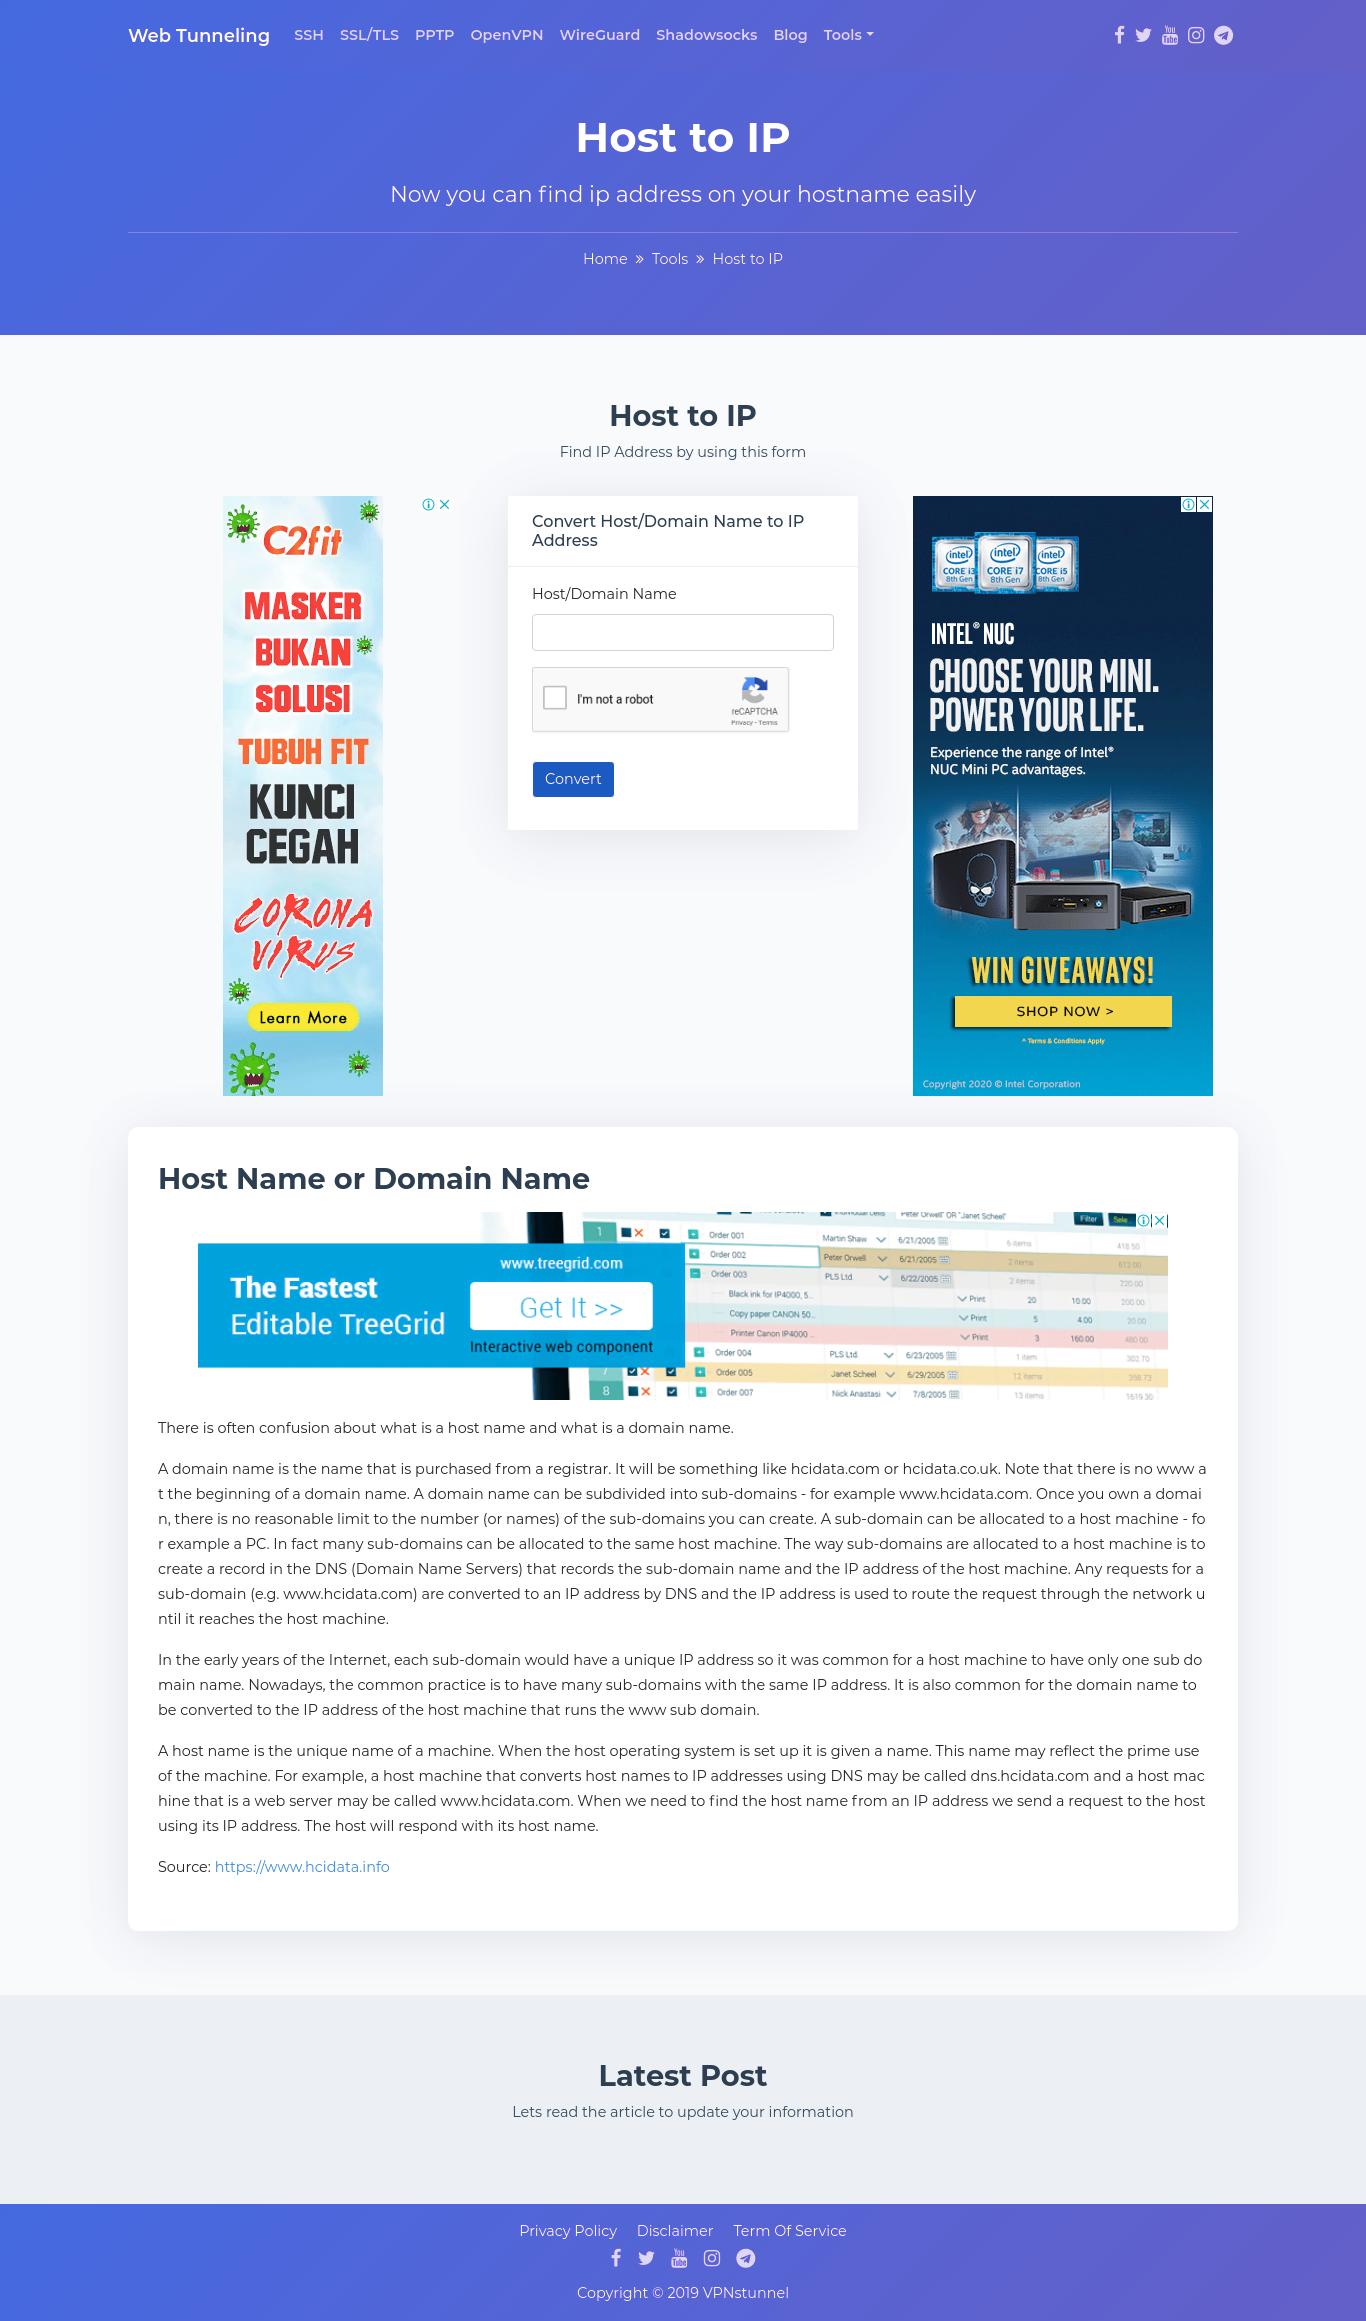 SSH Fast - Web Tunneling